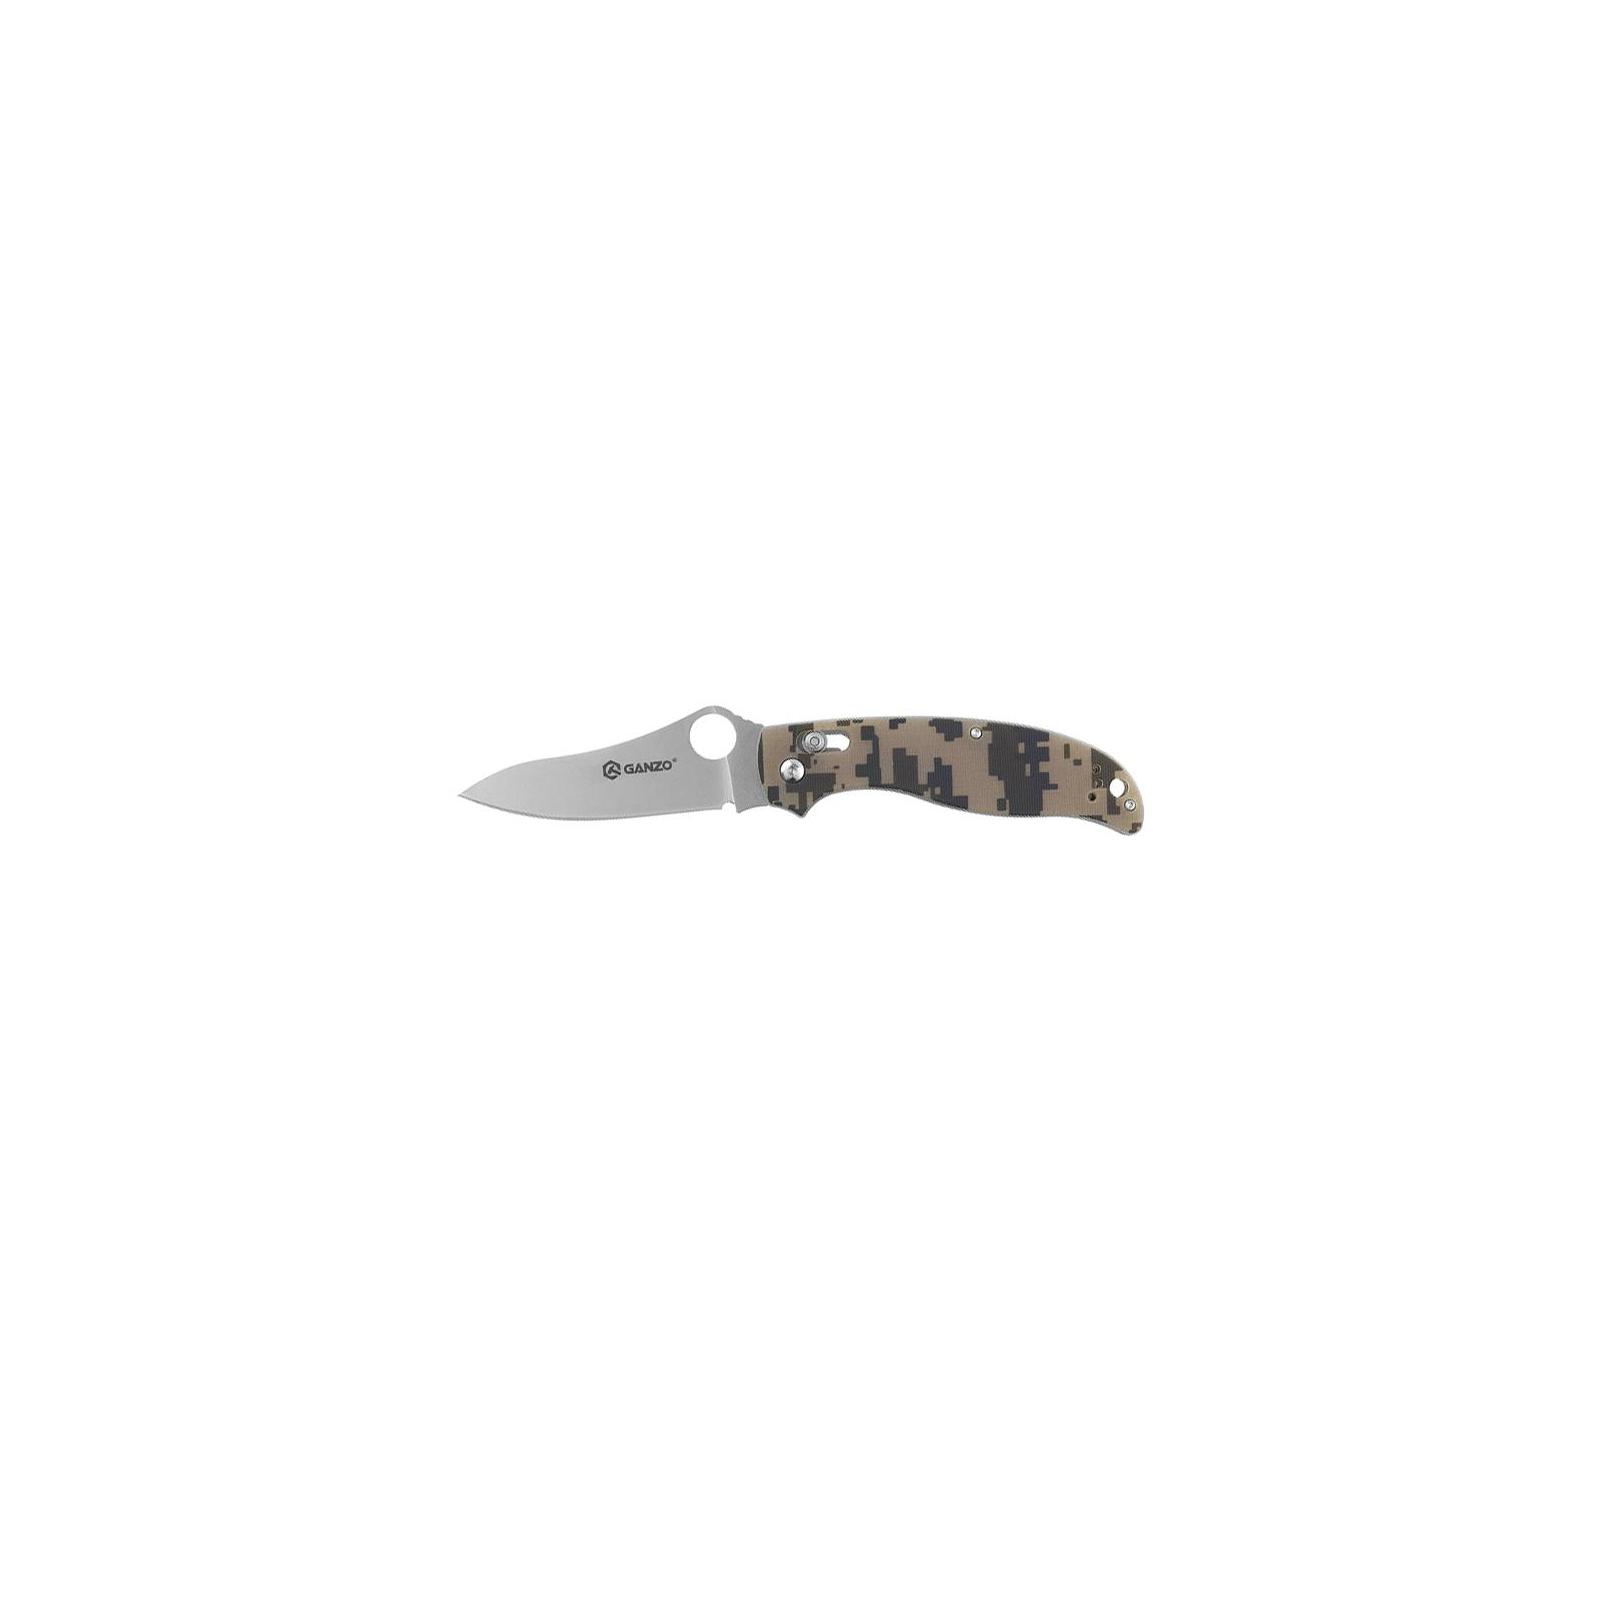 Нож Ganzo G7331-BK чёрный (2015-11-24) (G7331-BK)